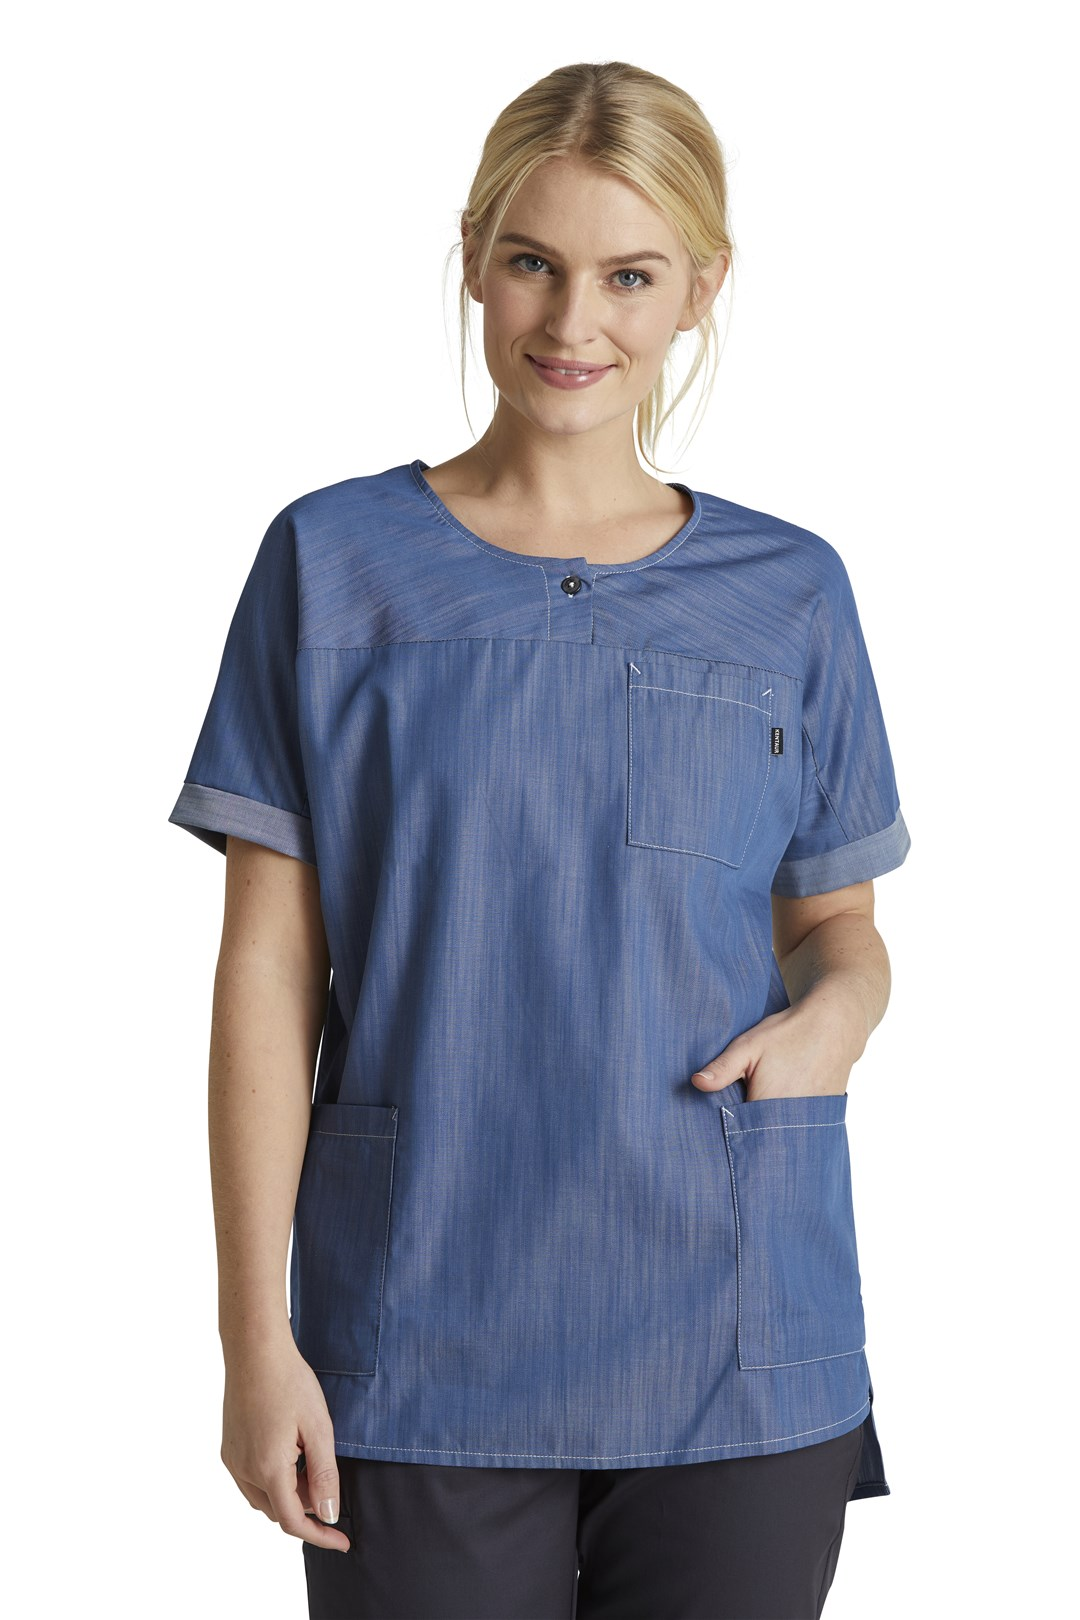 Kentaur hoitajan paita naisille Ladies Smock